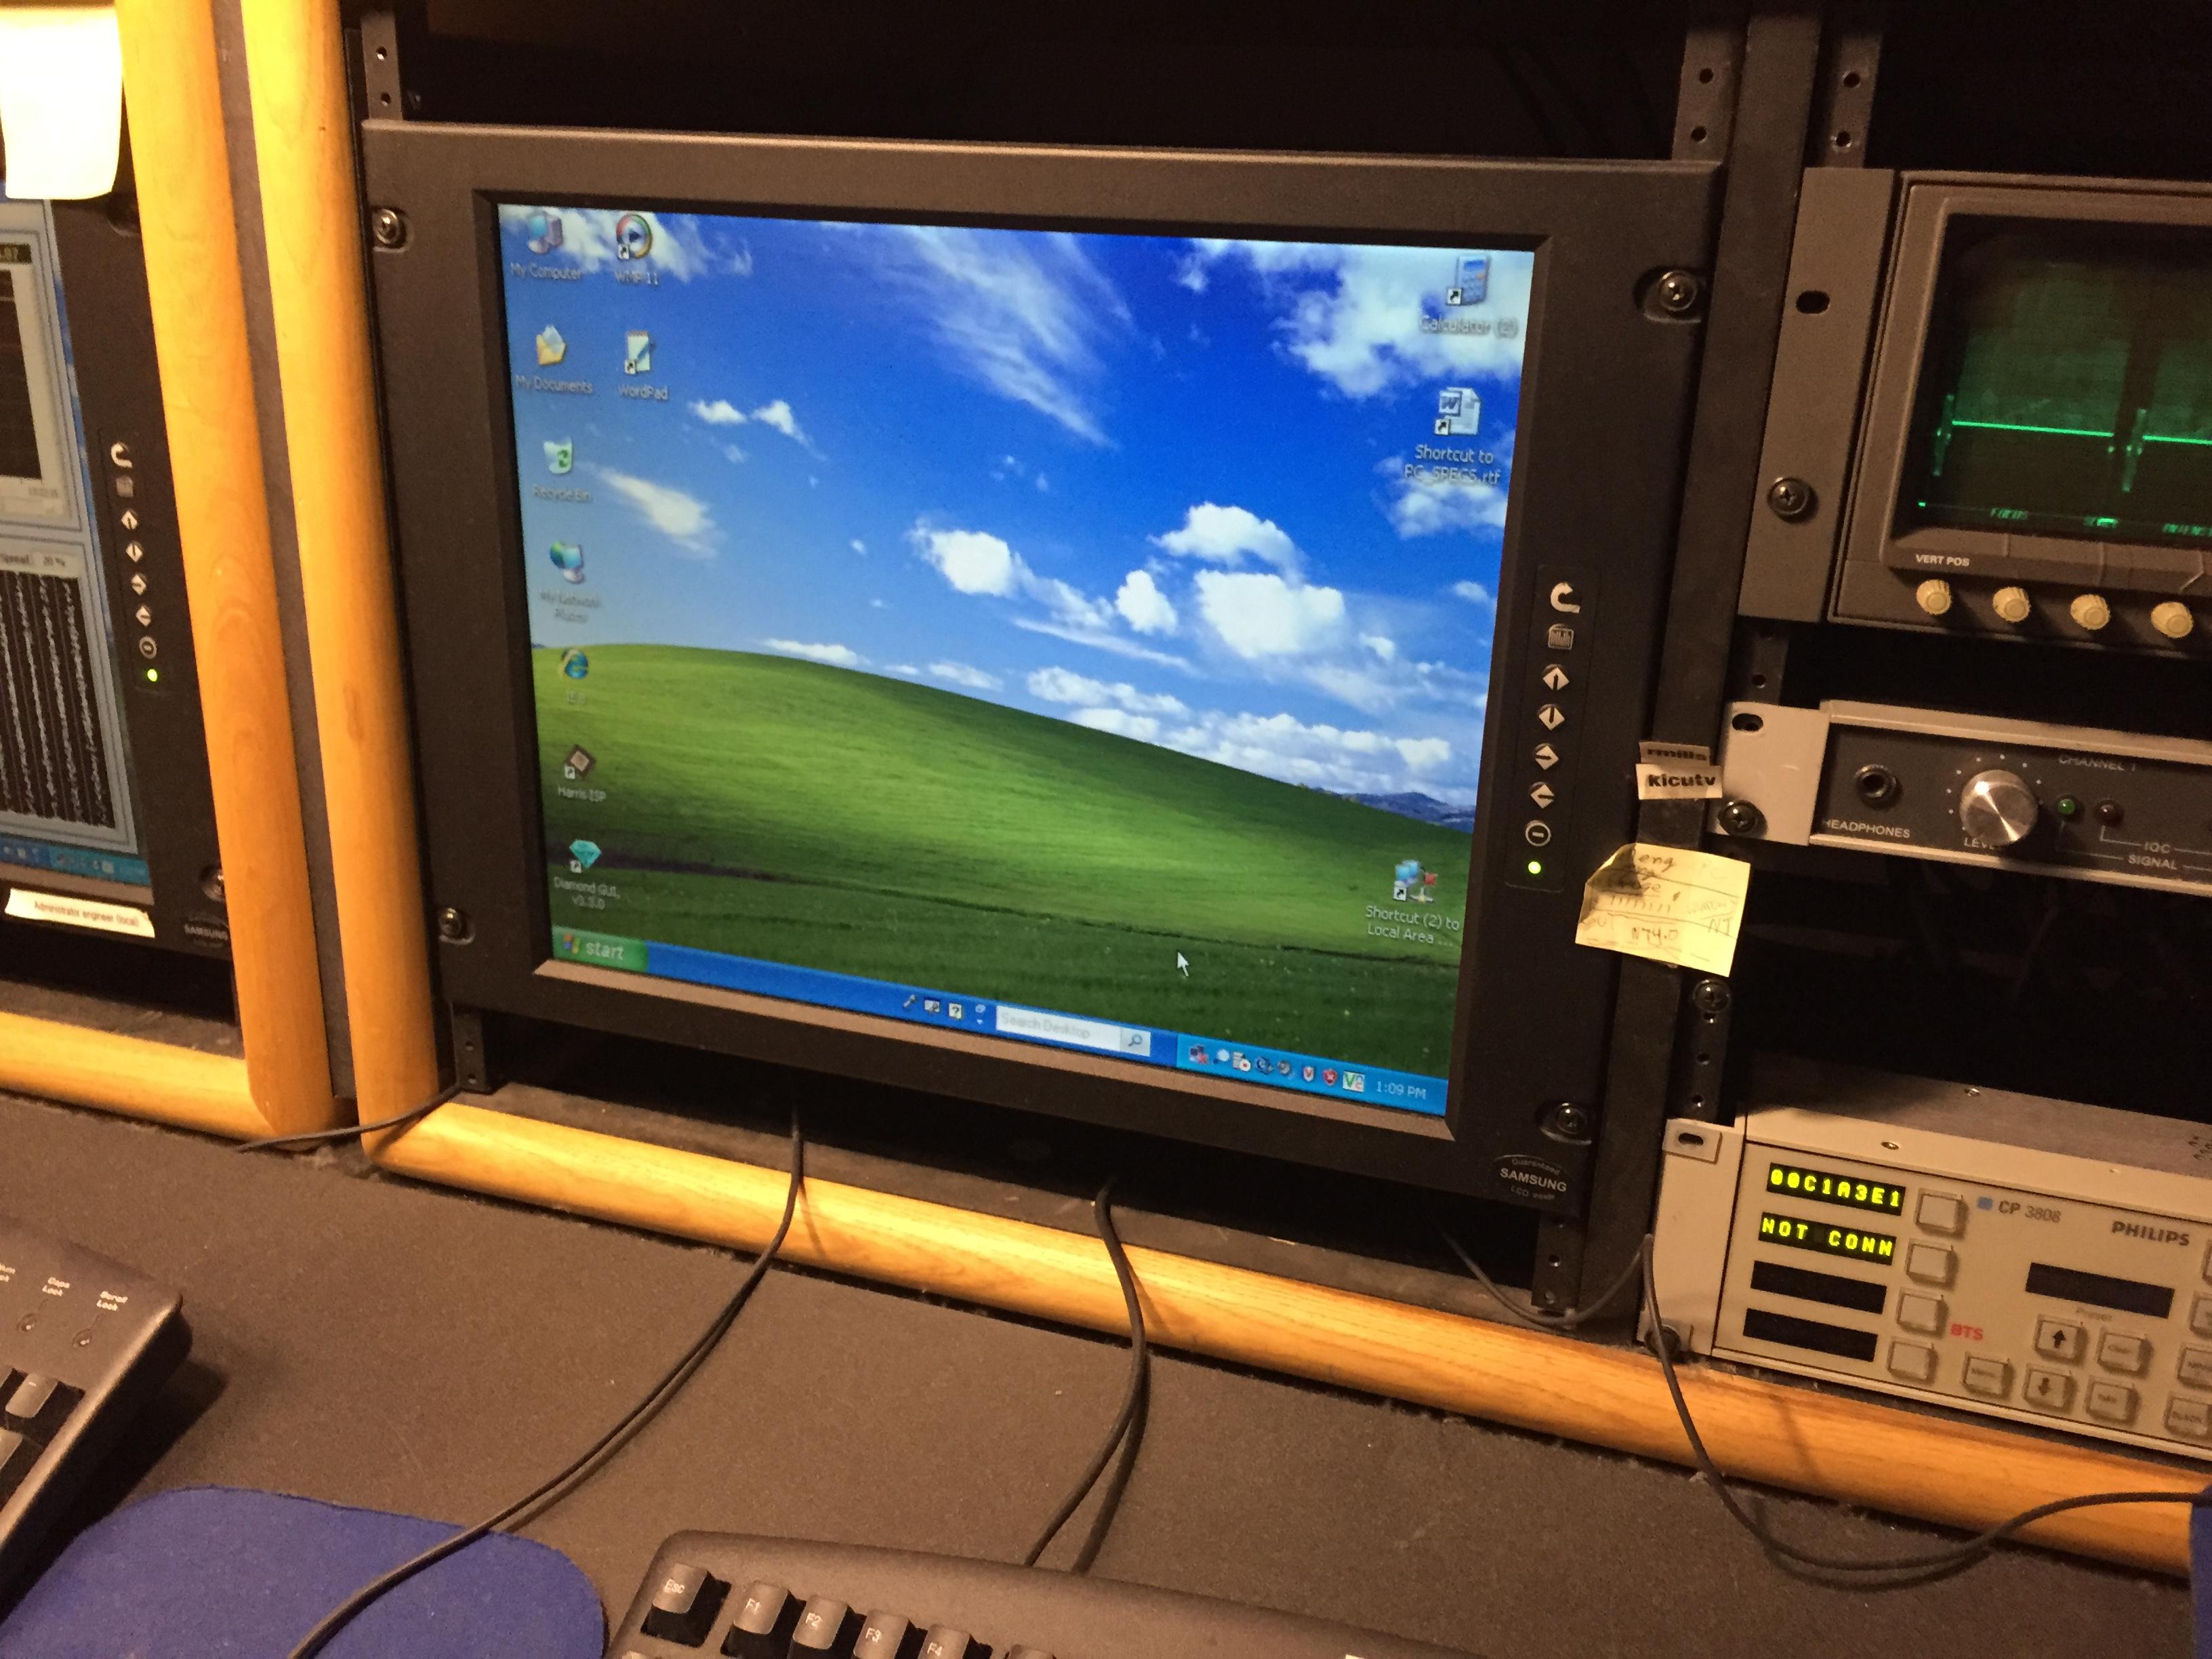 RM819-Rack Mount VGA Monitor